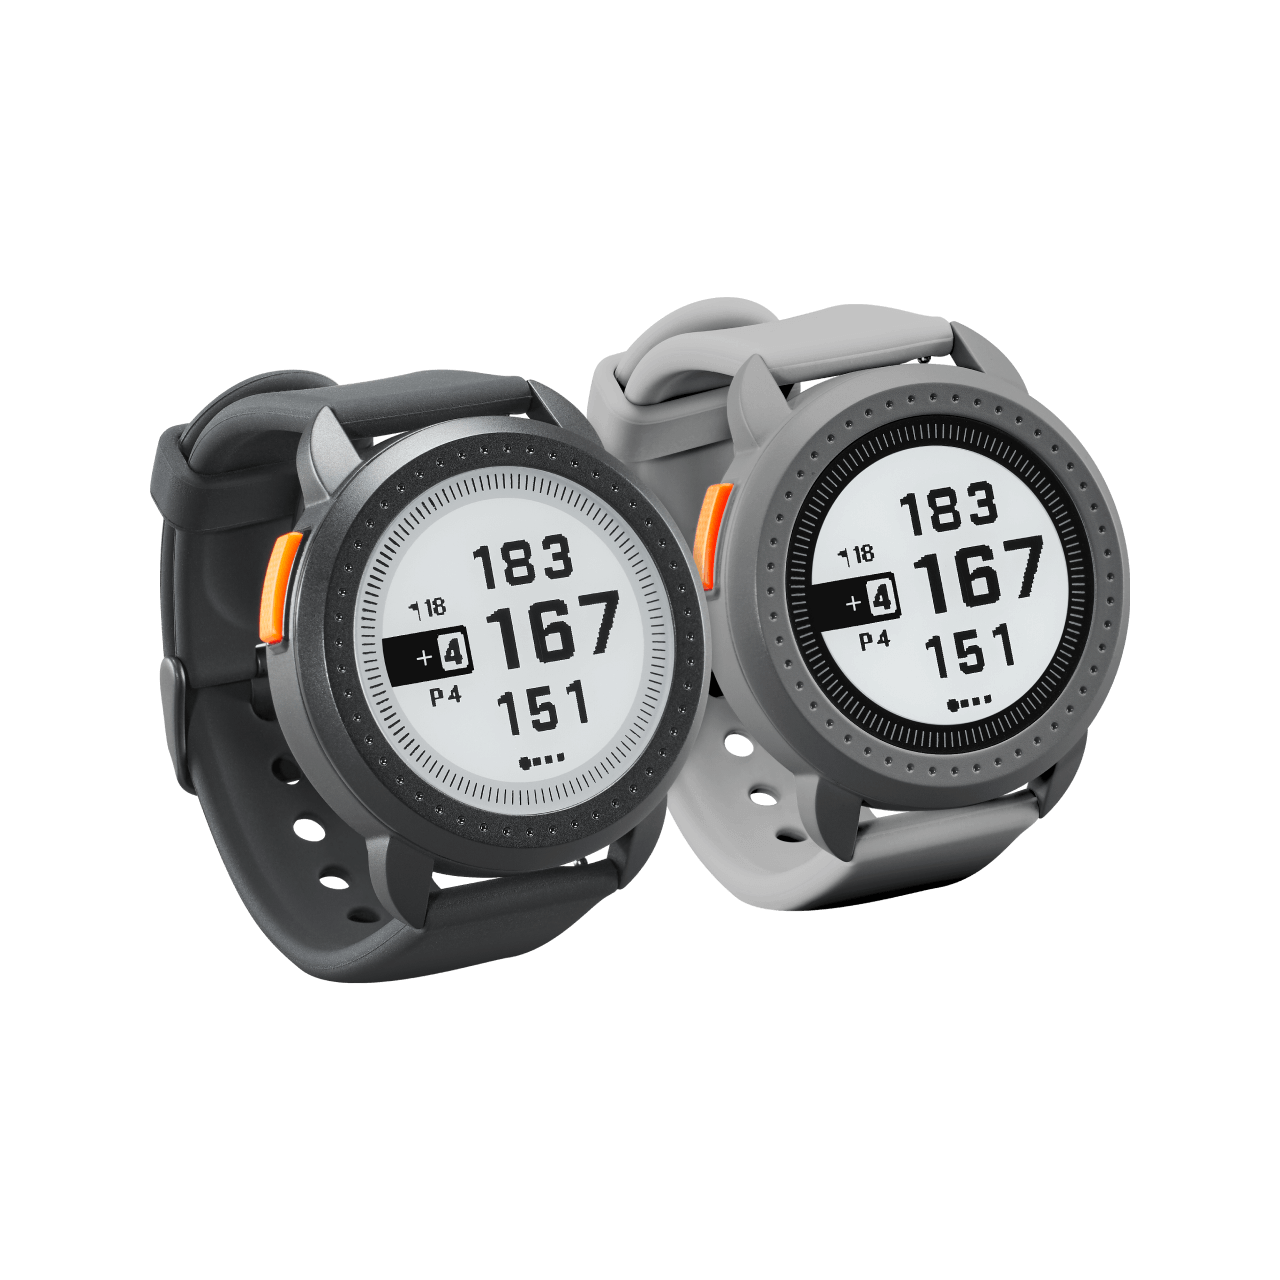 Bushnell iON Edge GPS Watch